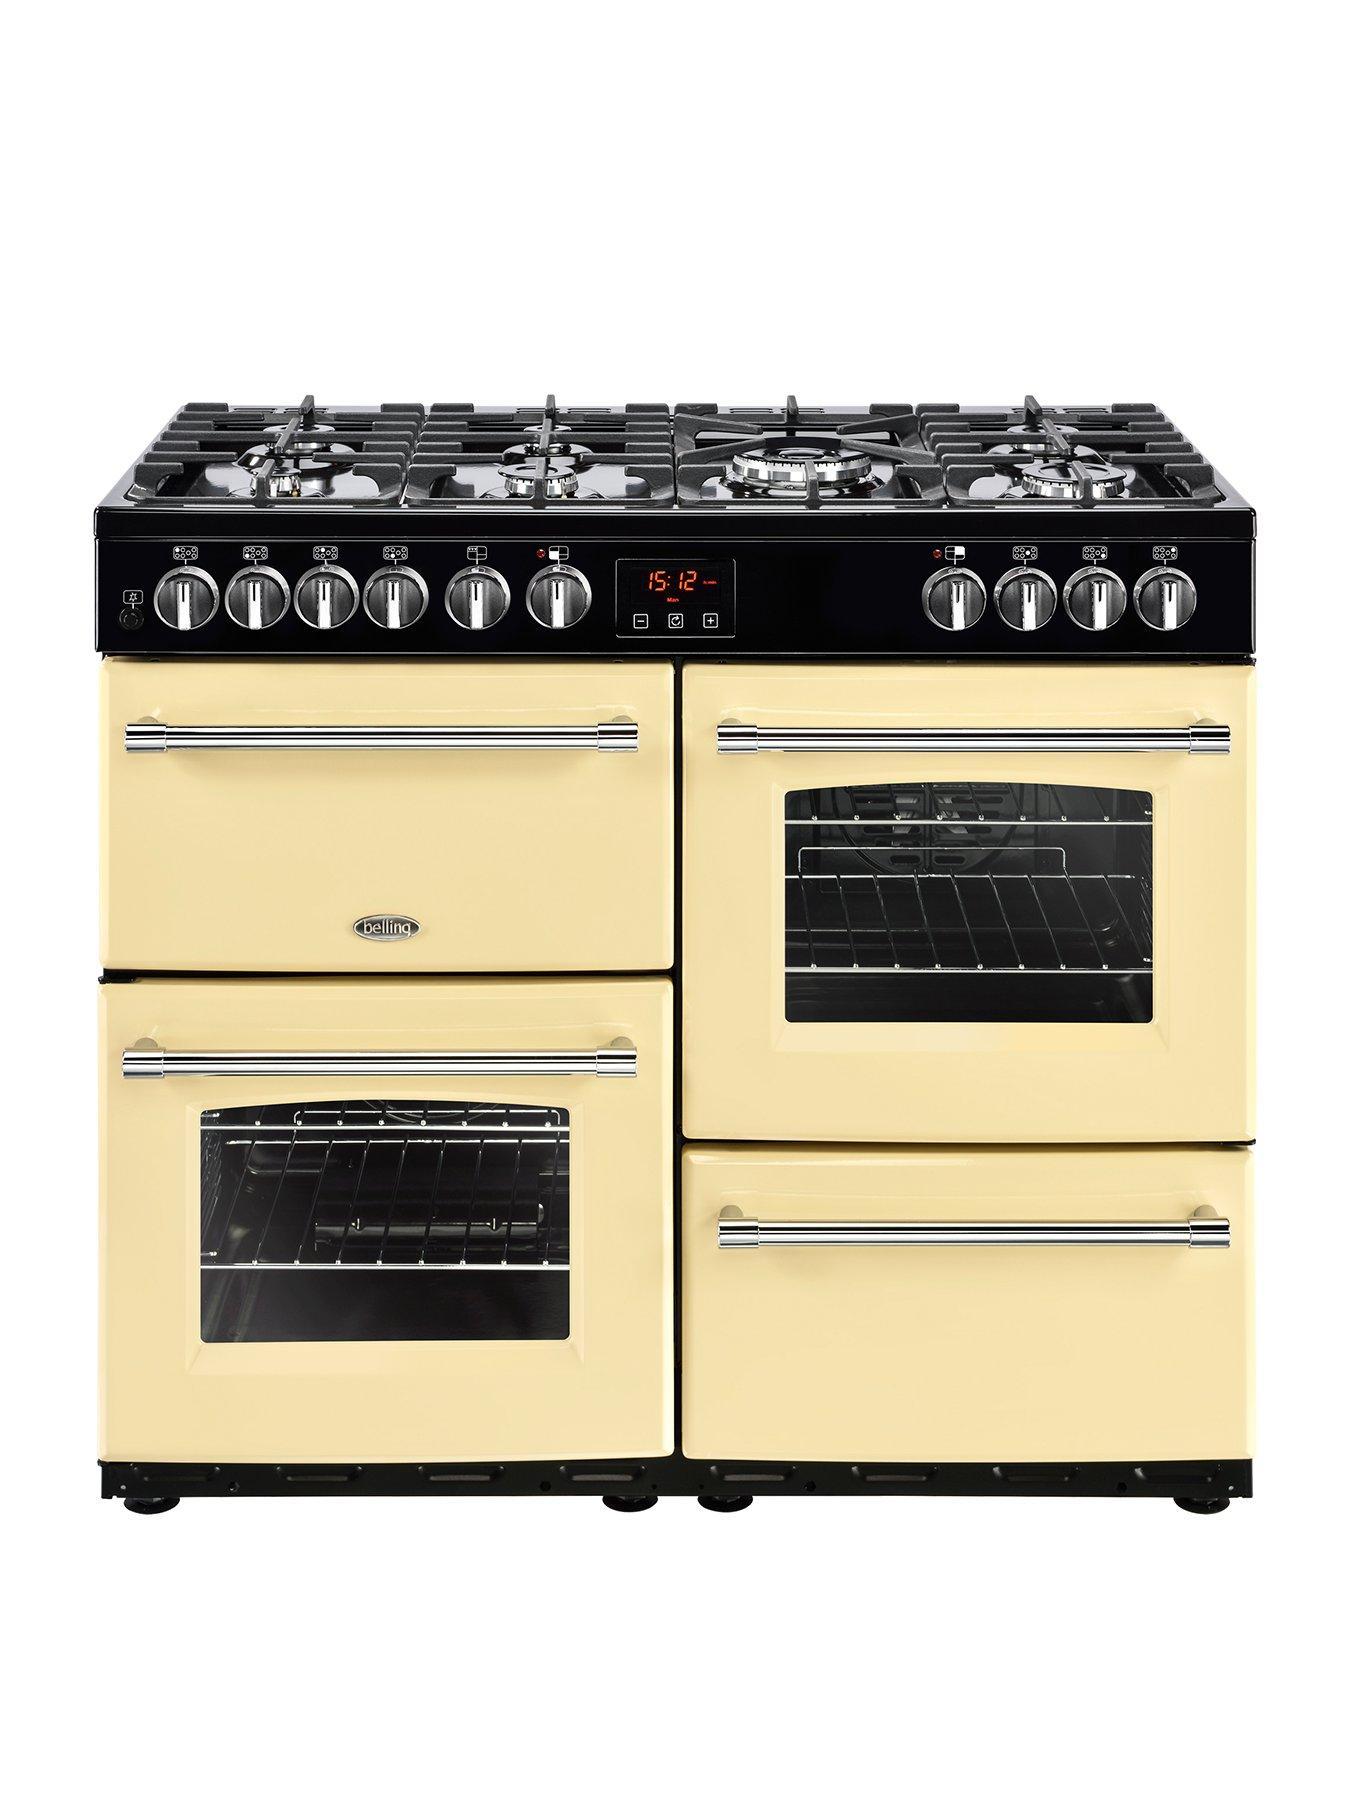 KGA-SUPPLIES BELLING Small Adjustable Extendable Chrome Range Mini Oven Cooker Shelf Rack